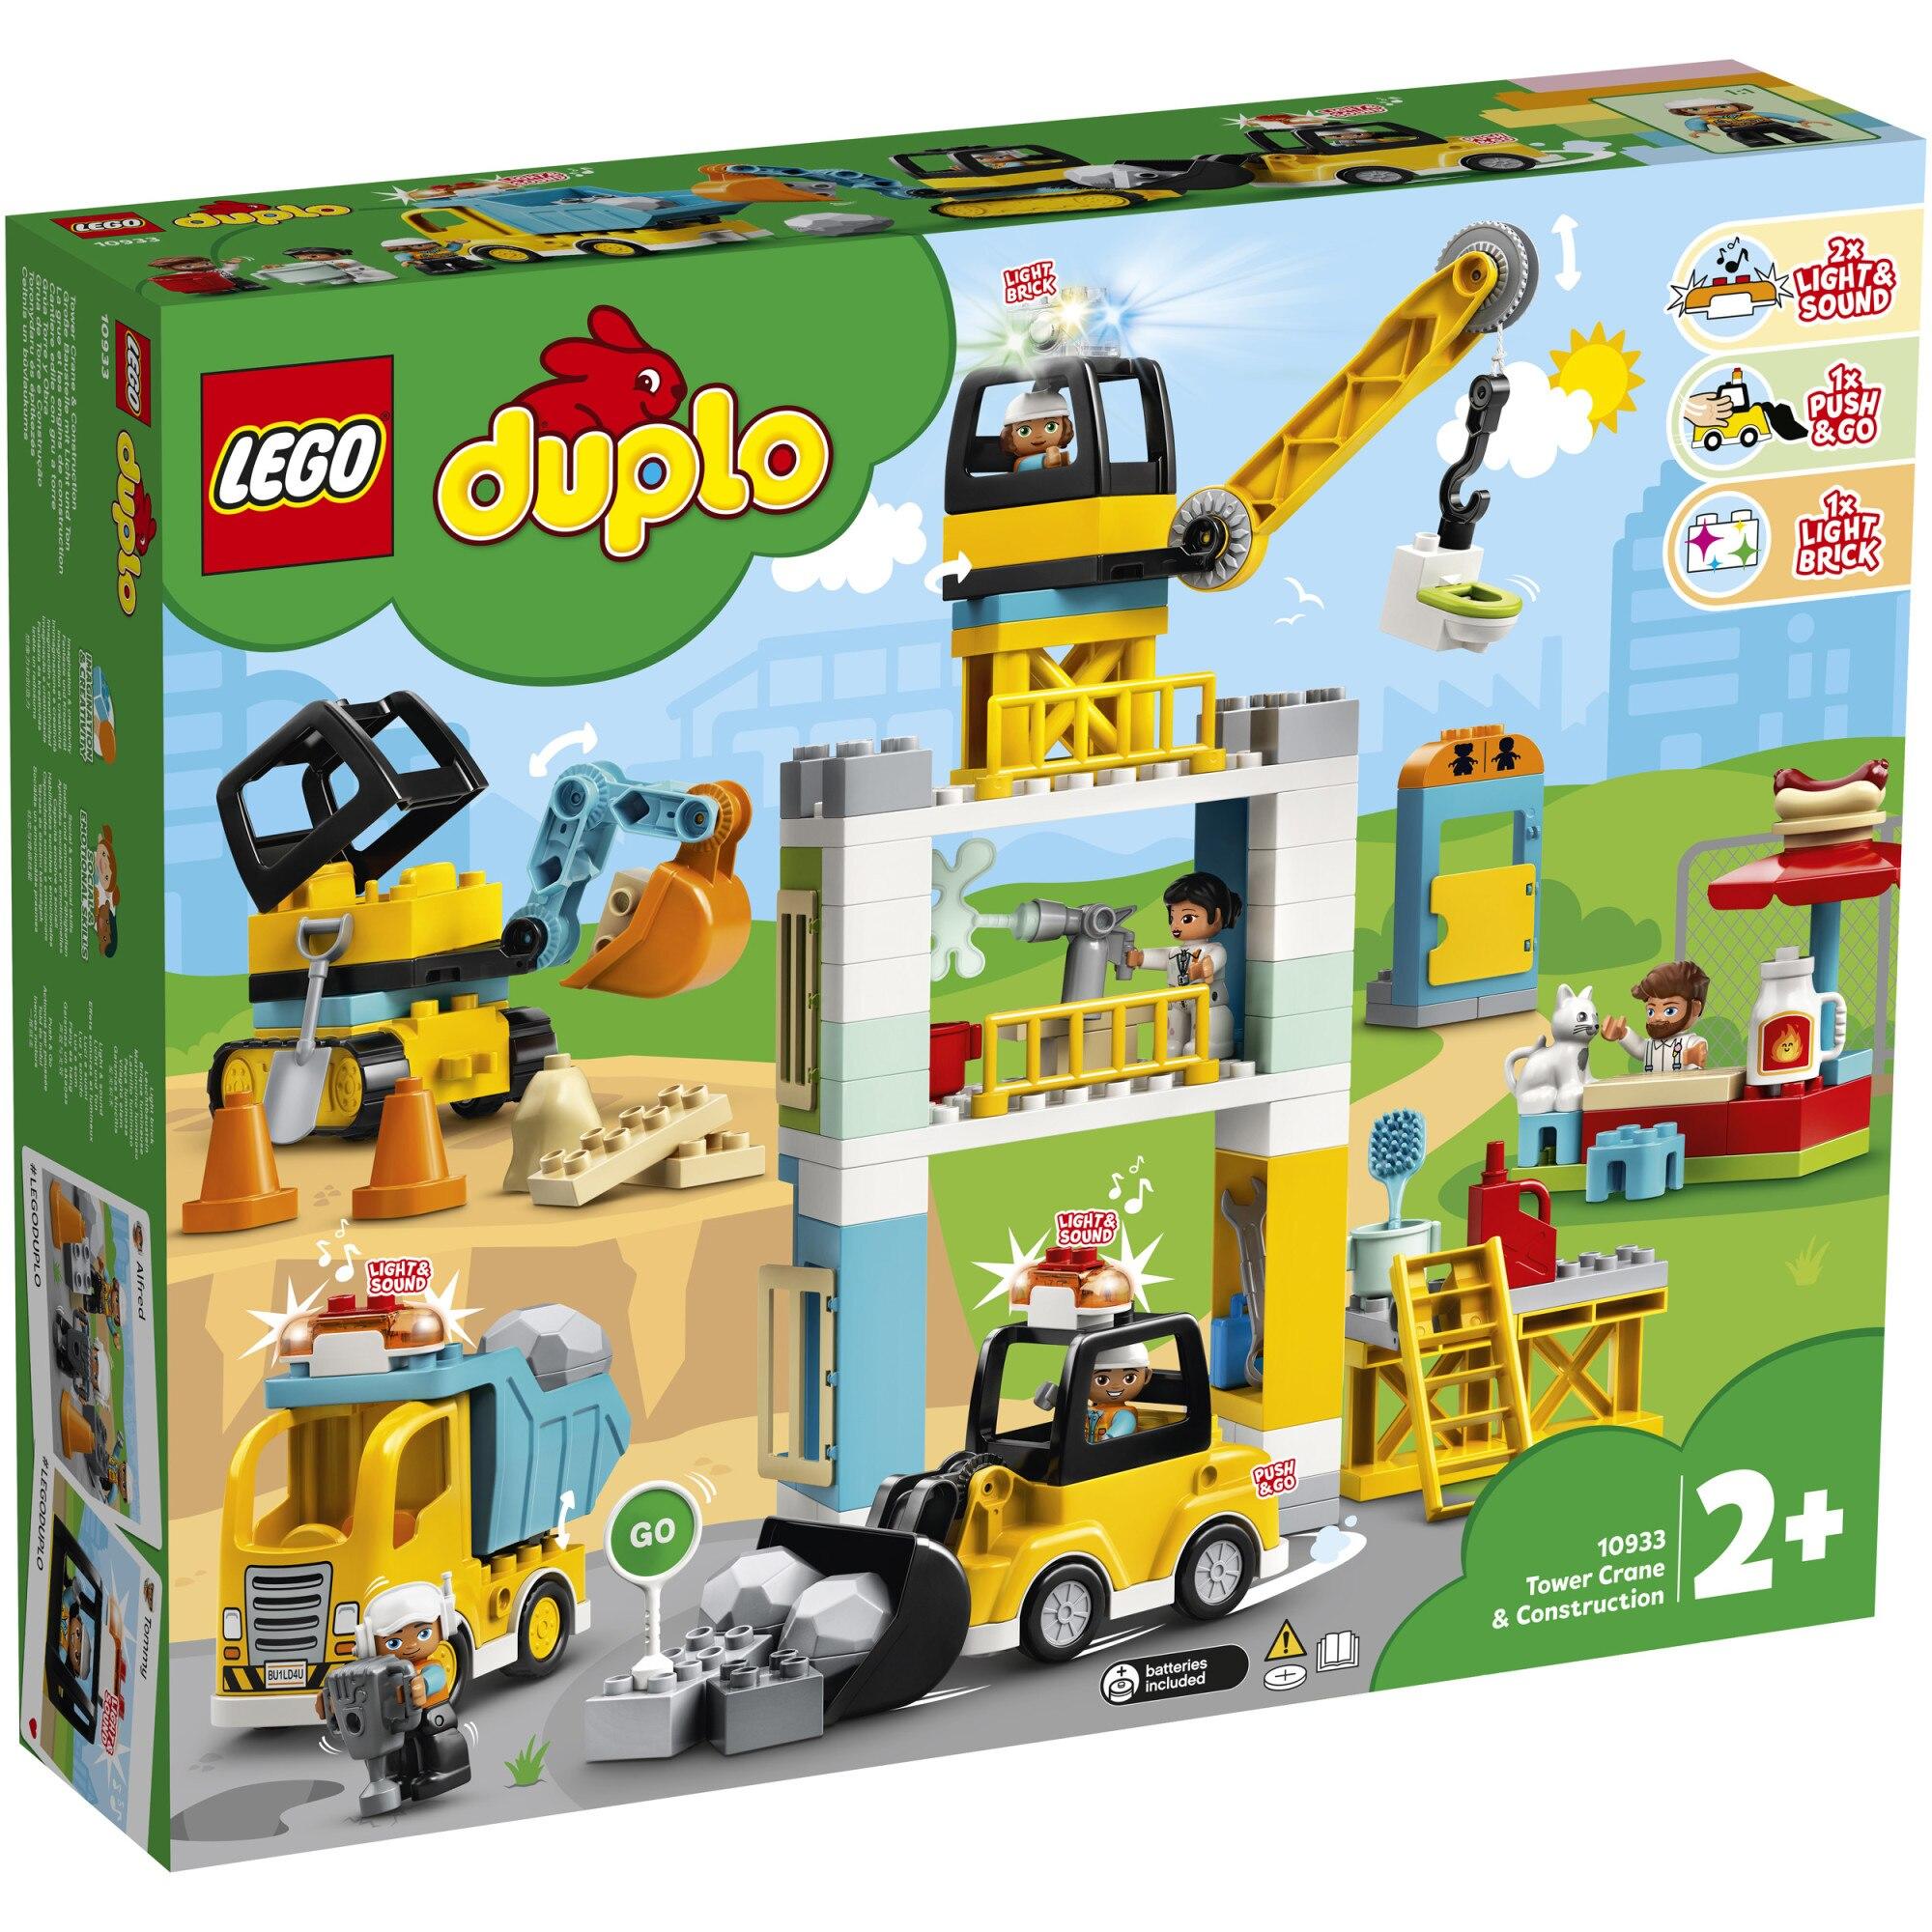 Fotografie LEGO DUPLO - Macara si constructie 10933